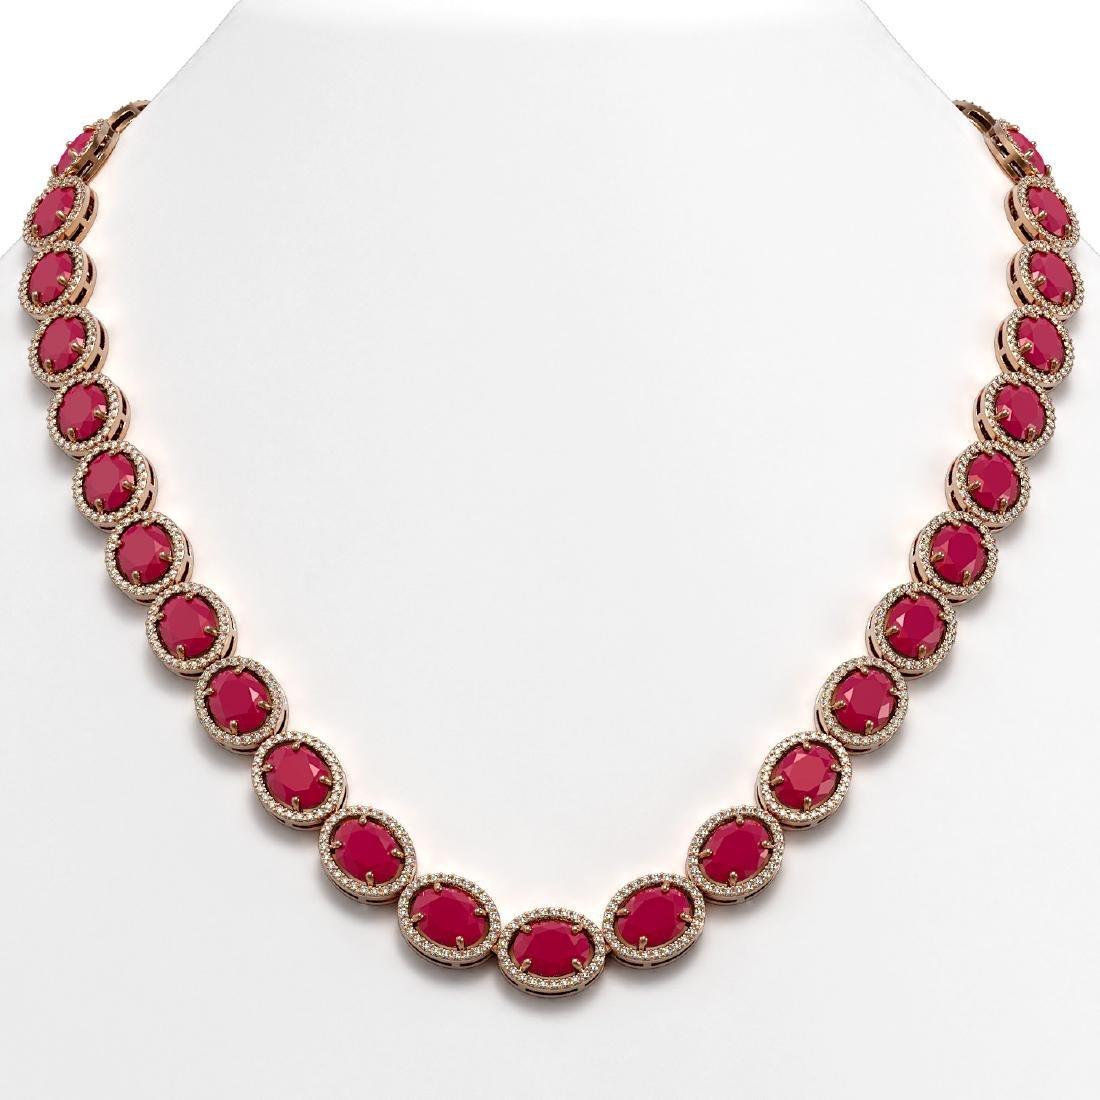 71.87 CTW Ruby & Diamond Halo Necklace 10K Rose Gold